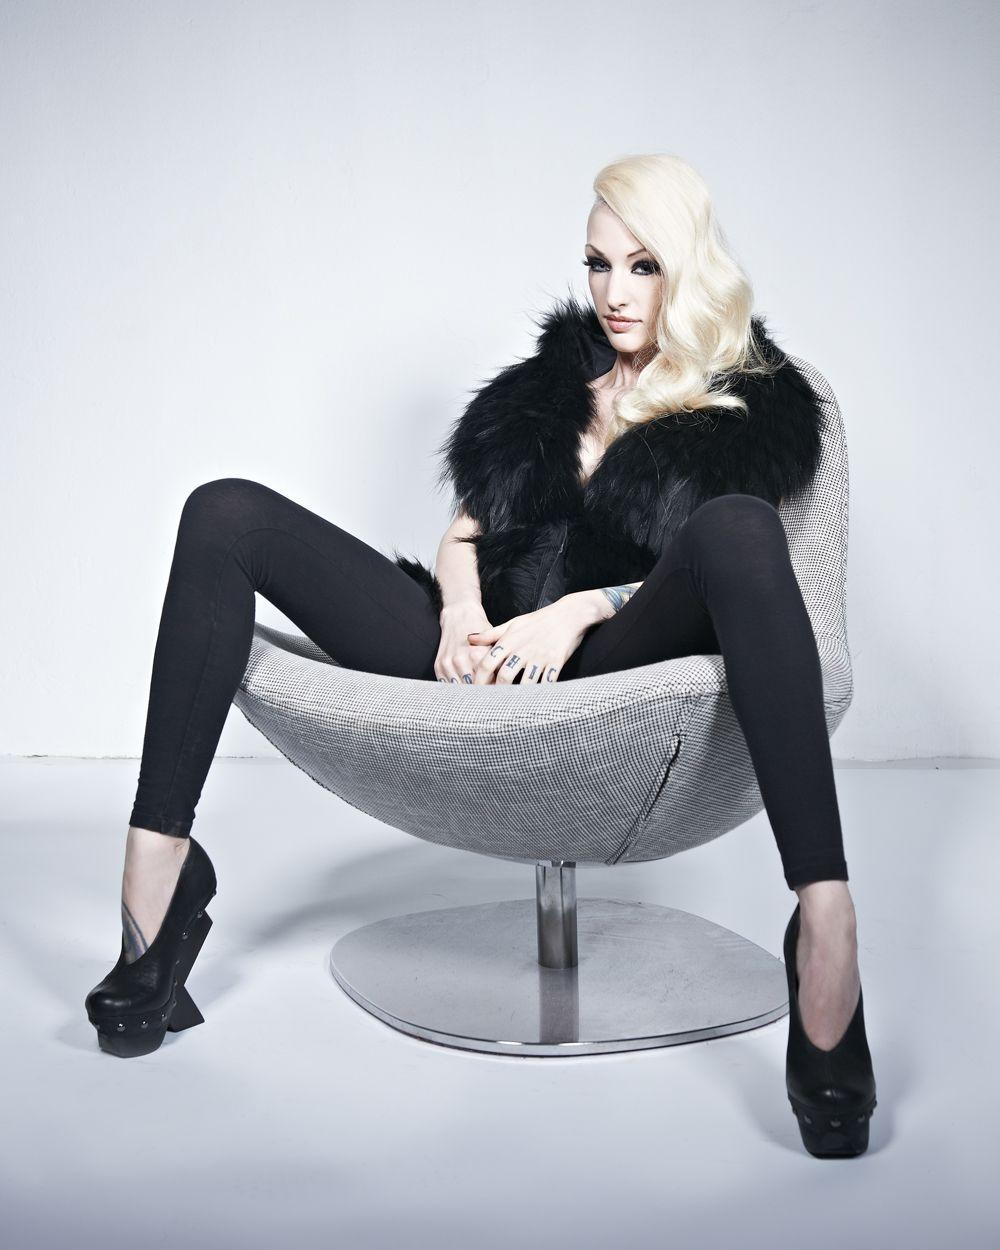 Sofia Valentine Nude Photos 36